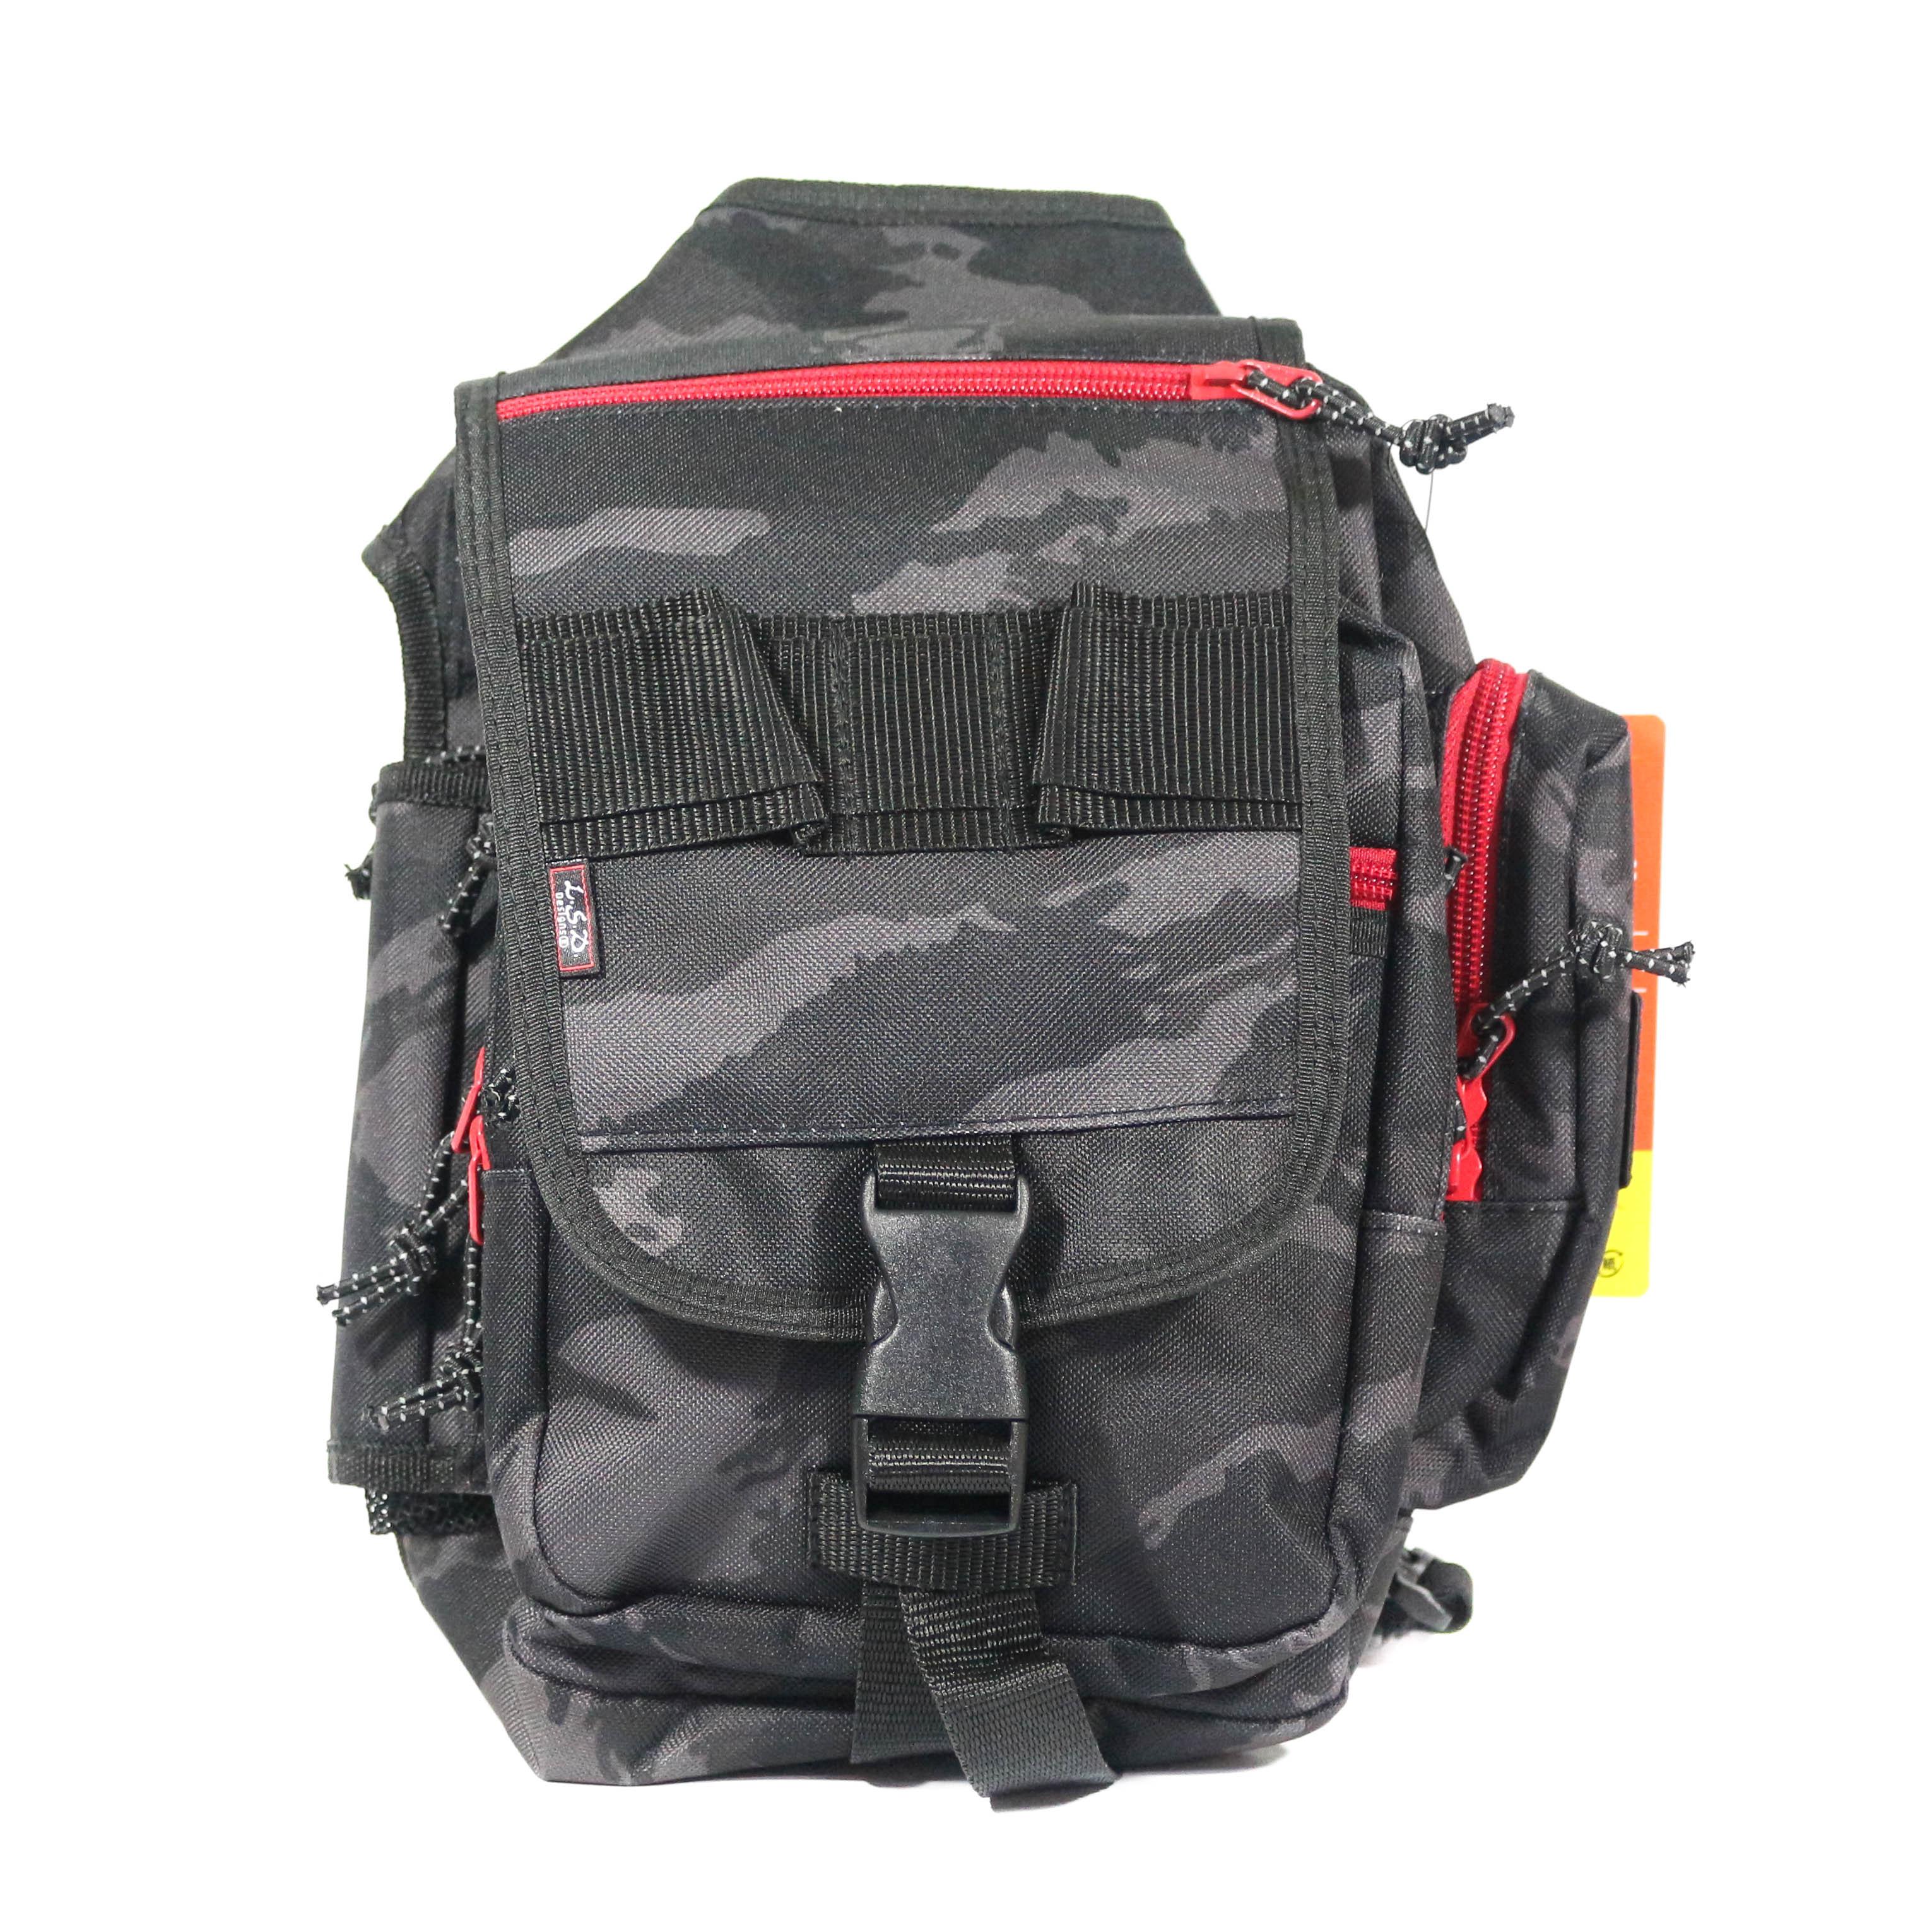 LSD One Shot Foot Bag Black Camo/Red Zipper 27 x 17 x 9 cm (9378)